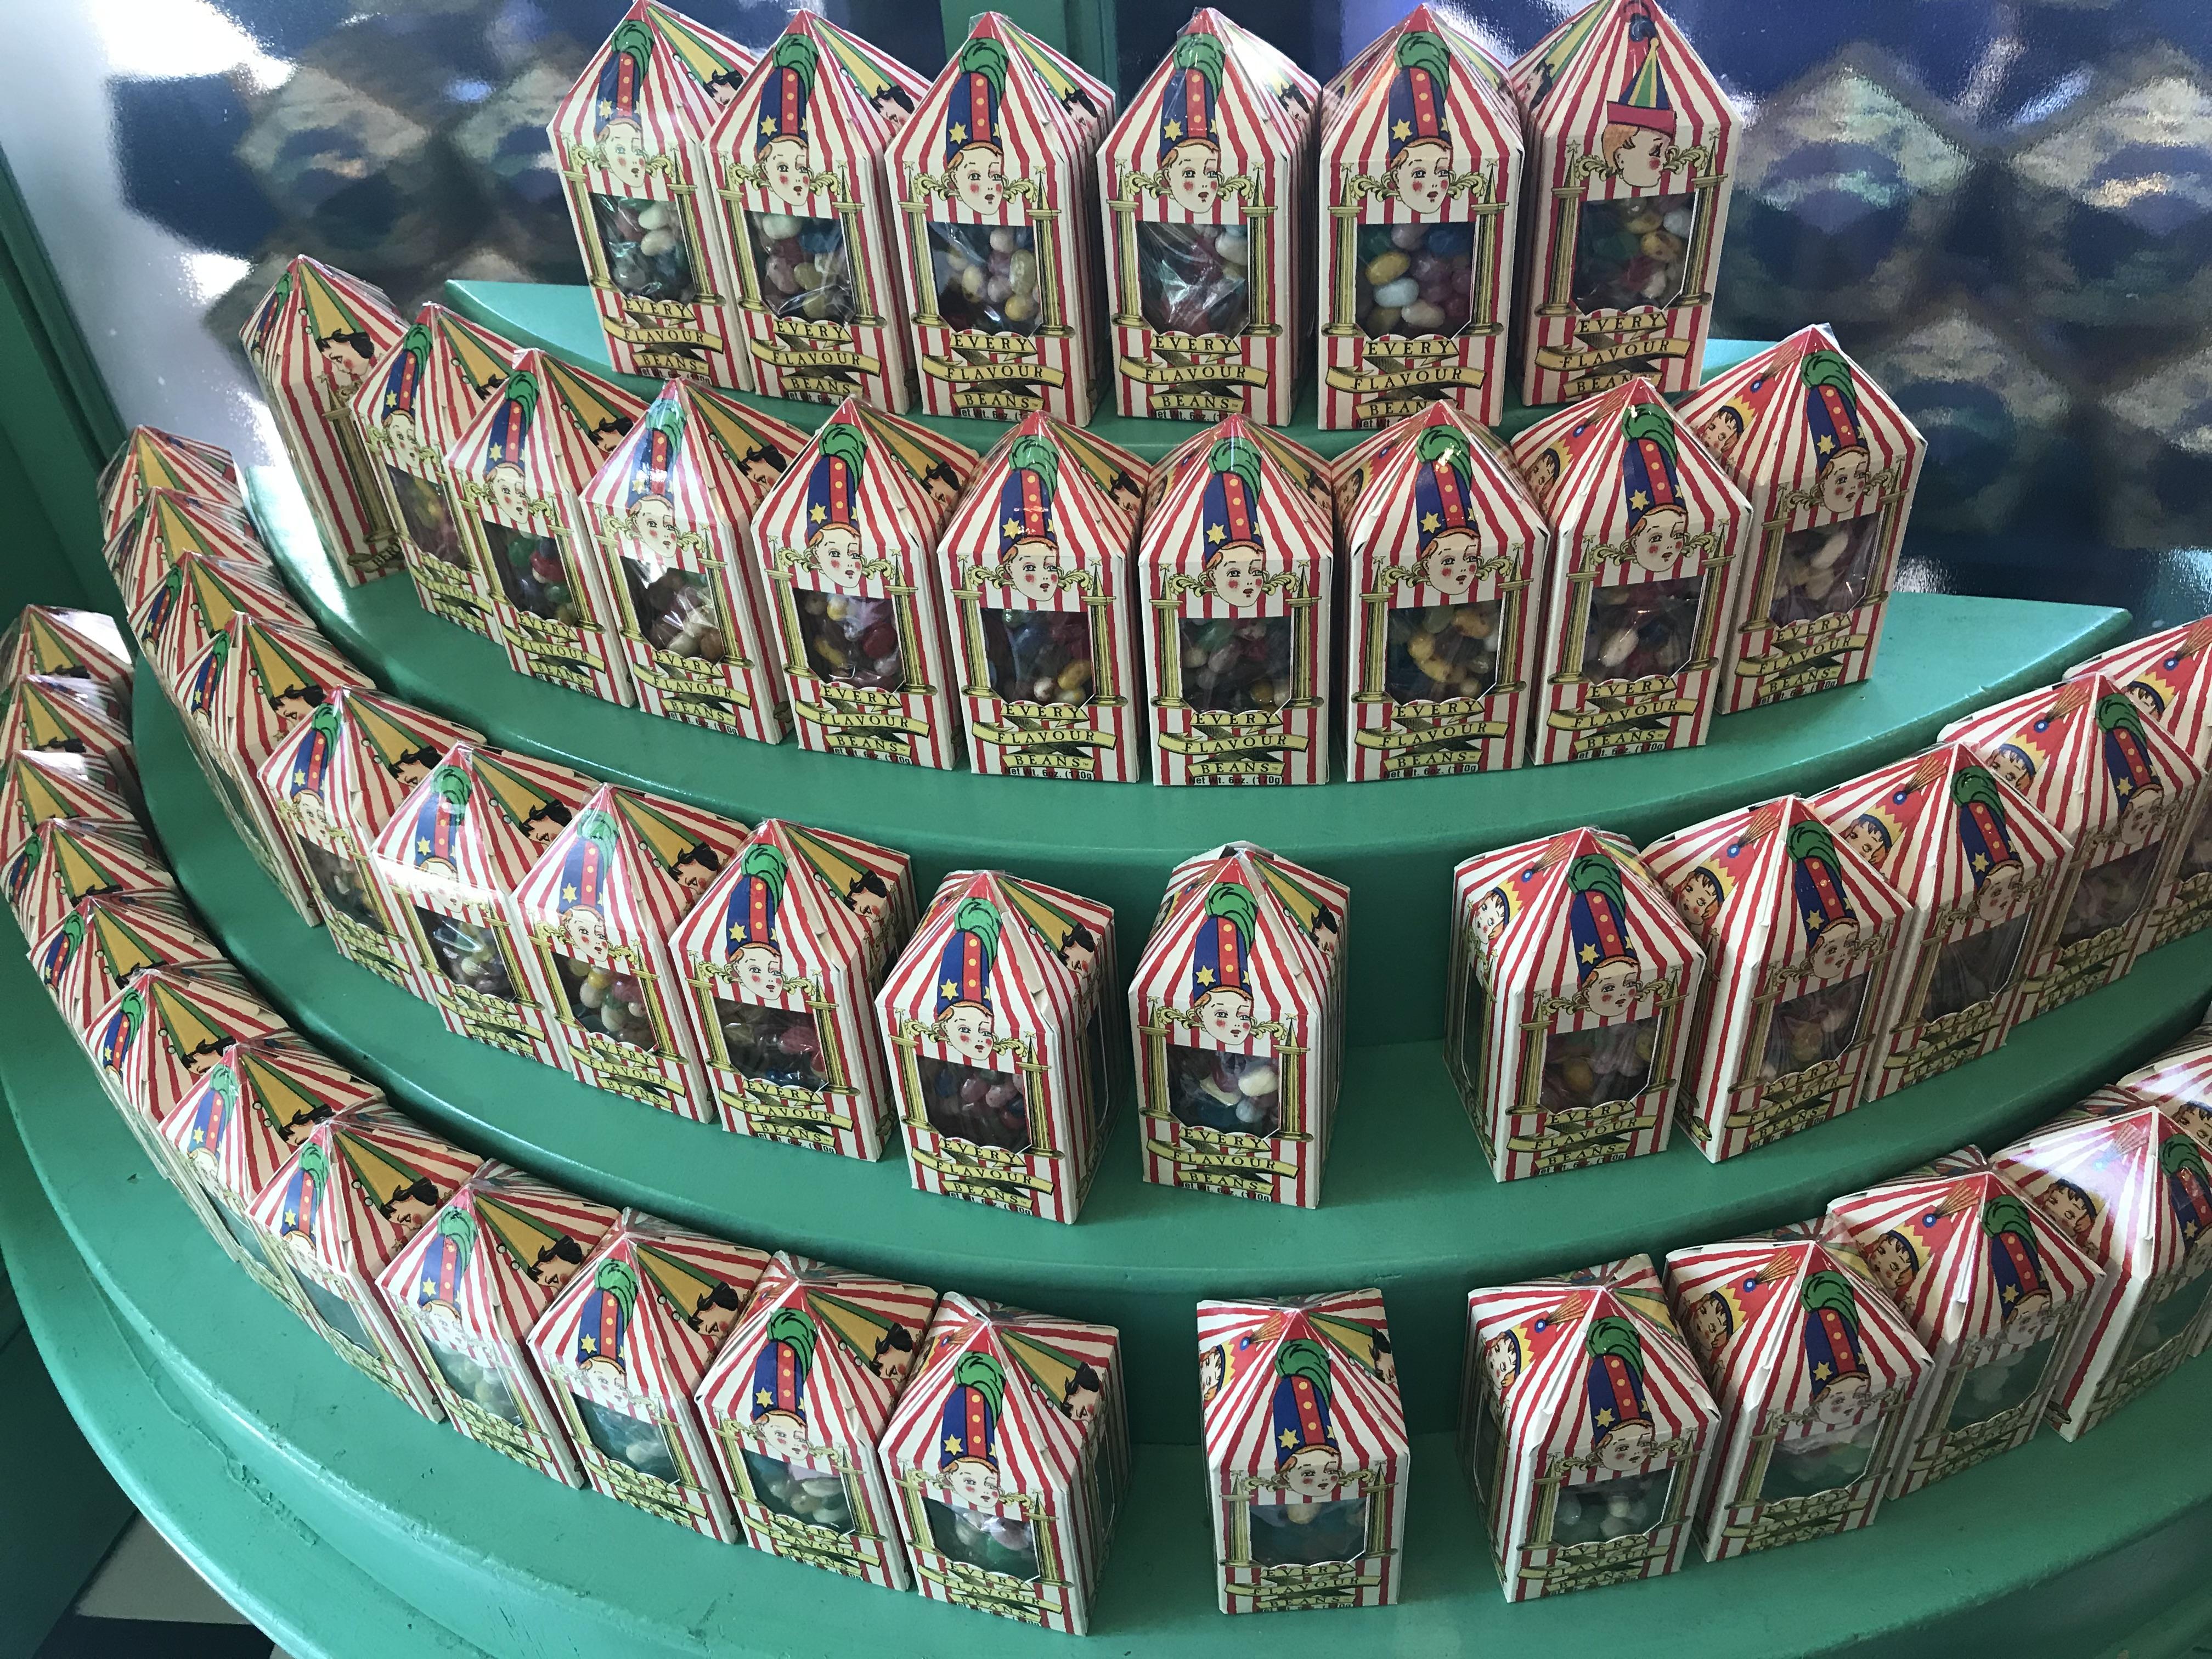 Universal Orlando Harry Potter souvenirs